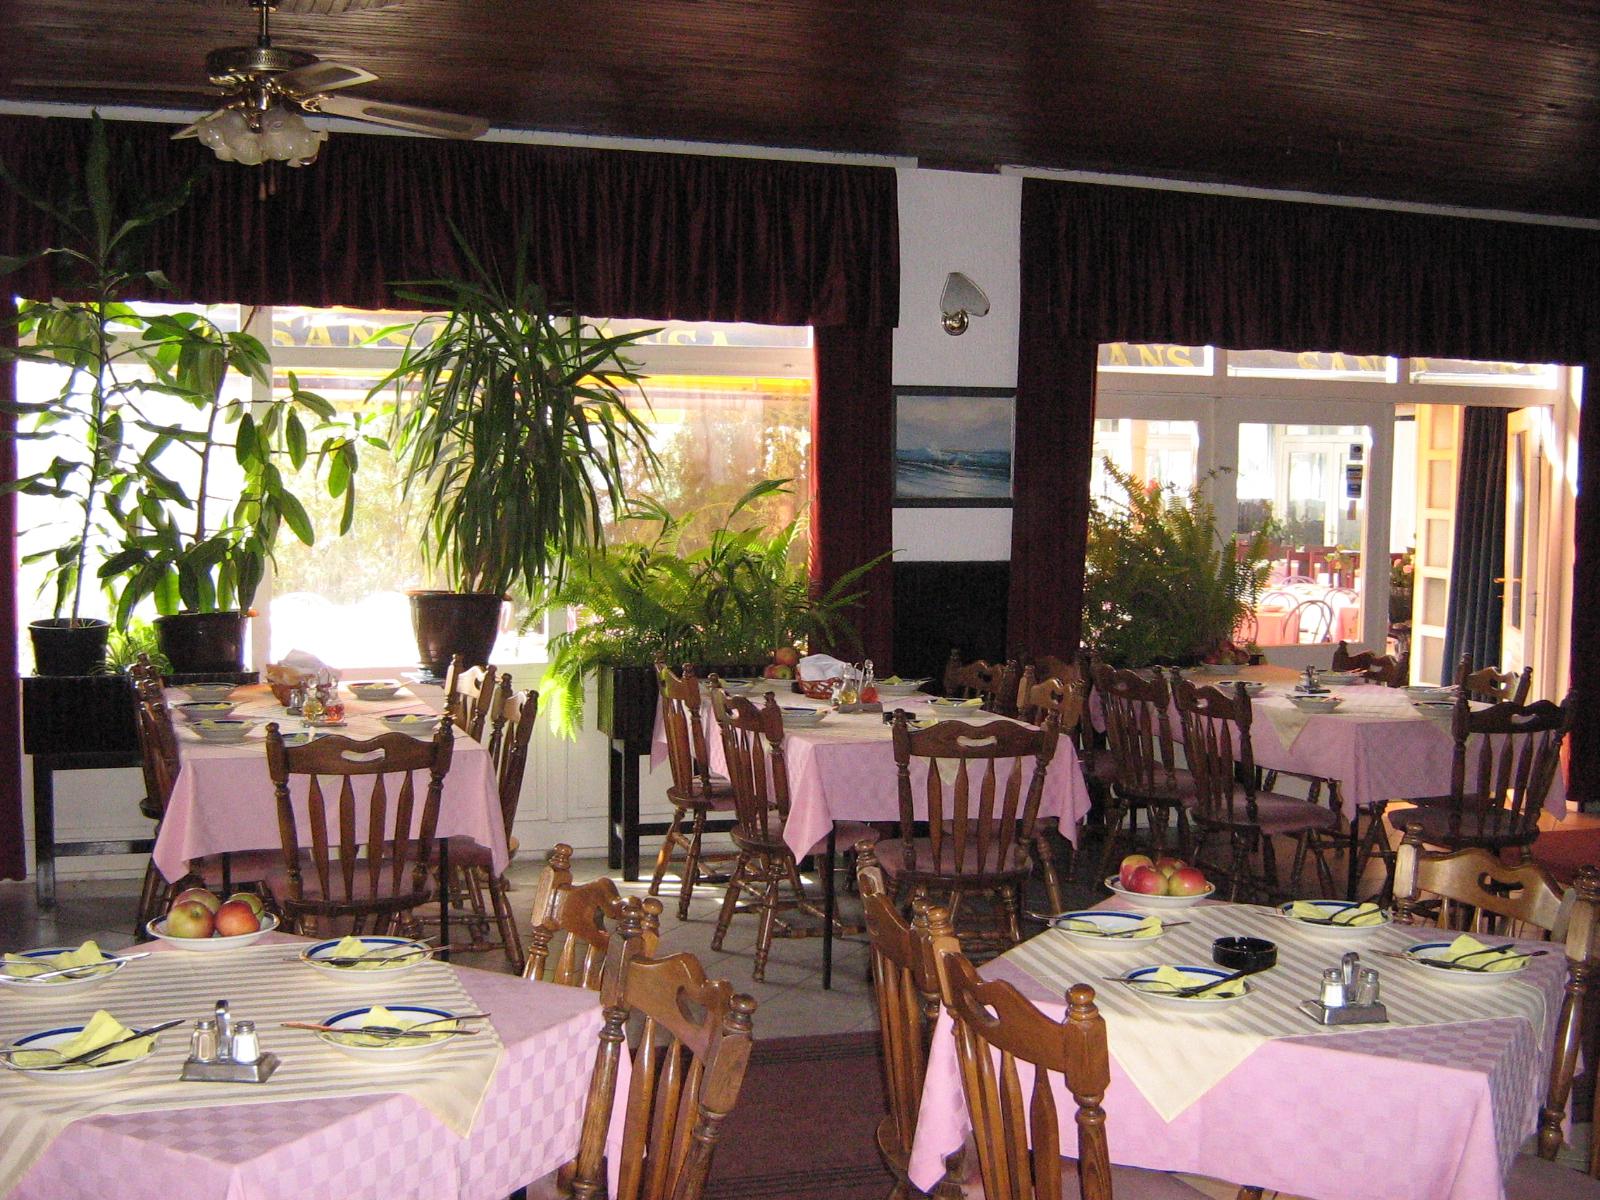 For Sale Hotel Palic Subotica Serbia Horgoski Put 35